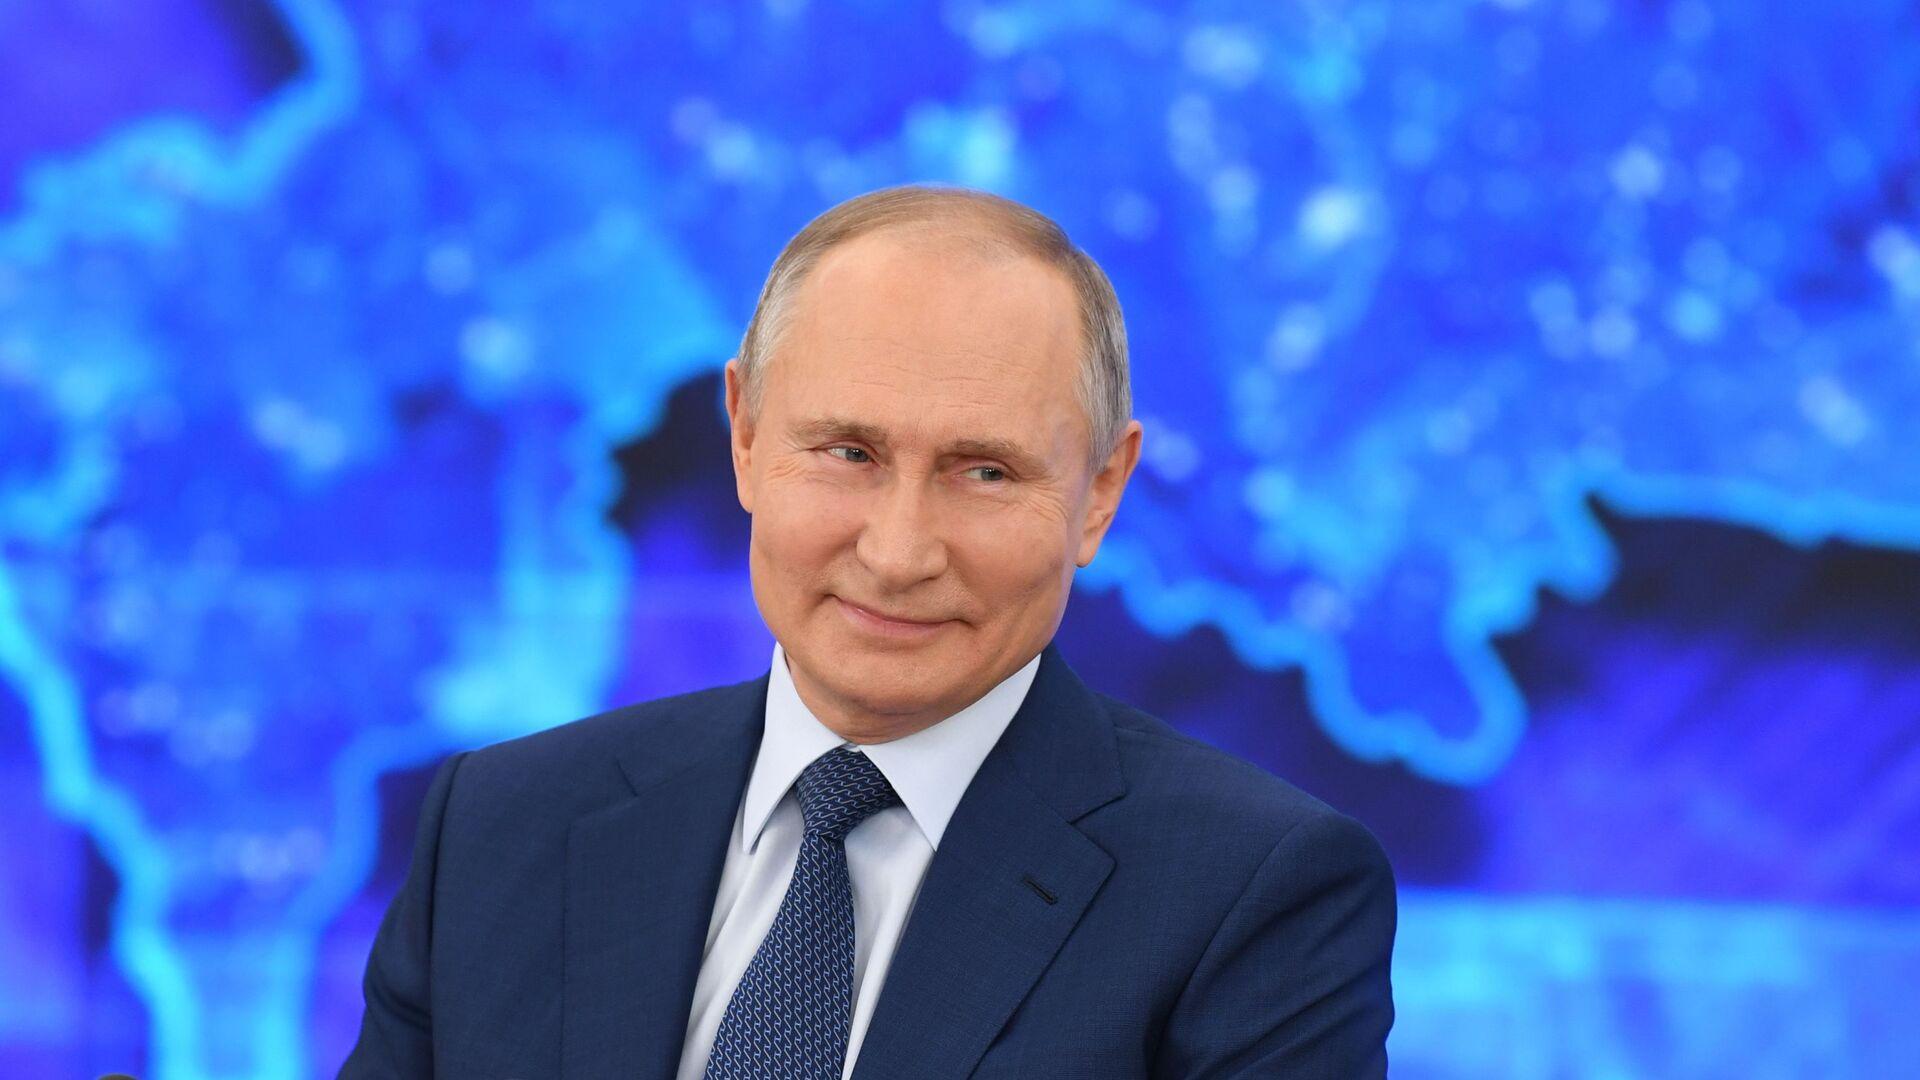 Ежегодная пресс-конференция президента РФ В. Путина - Sputnik Таджикистан, 1920, 12.06.2021